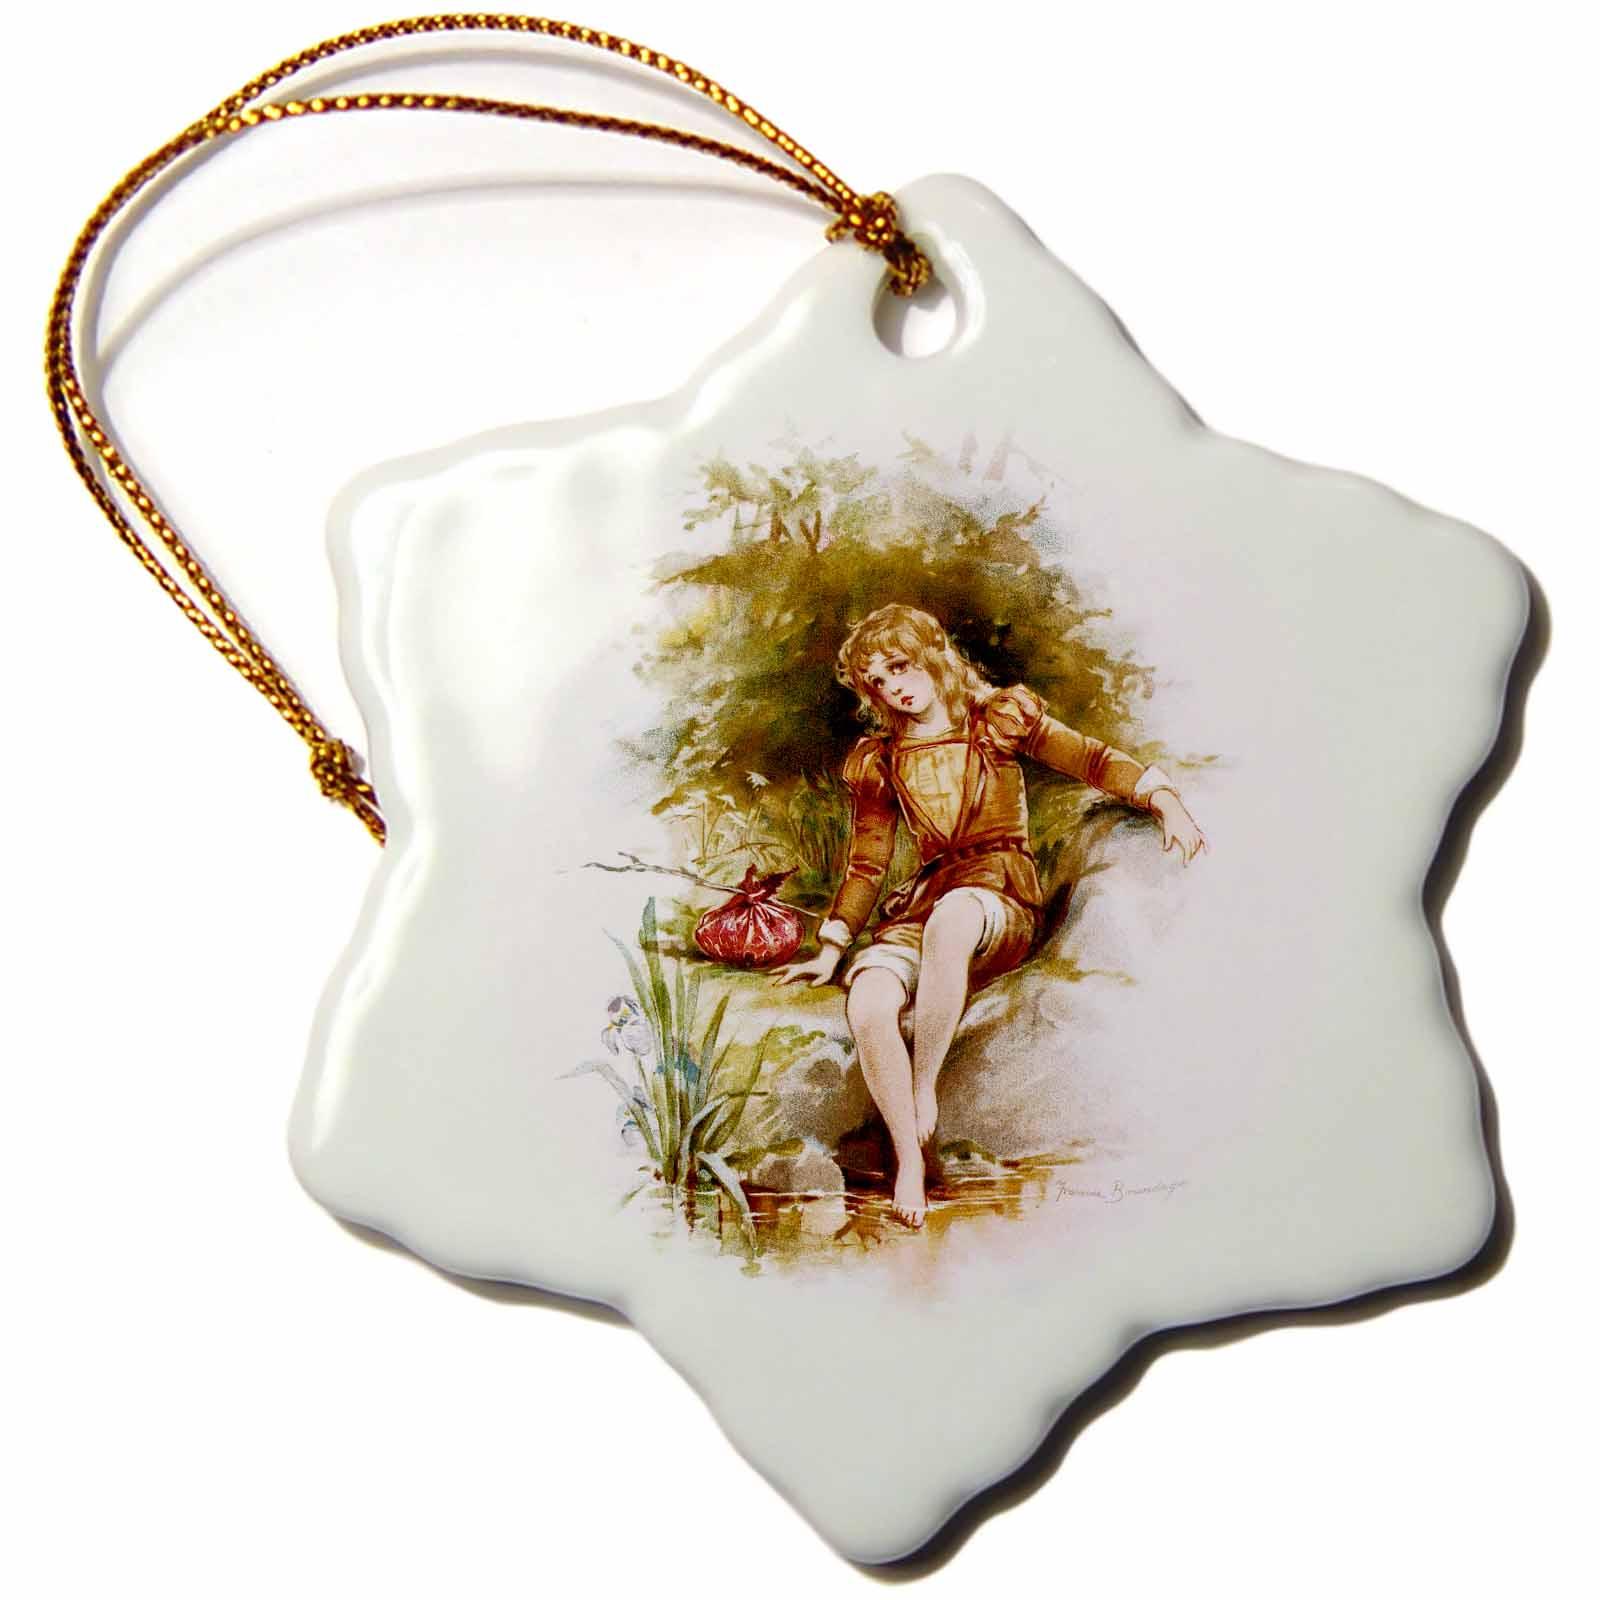 3dRose Brundage – Cymbeline, Snowflake Ornament, Porcelain, 3-inch